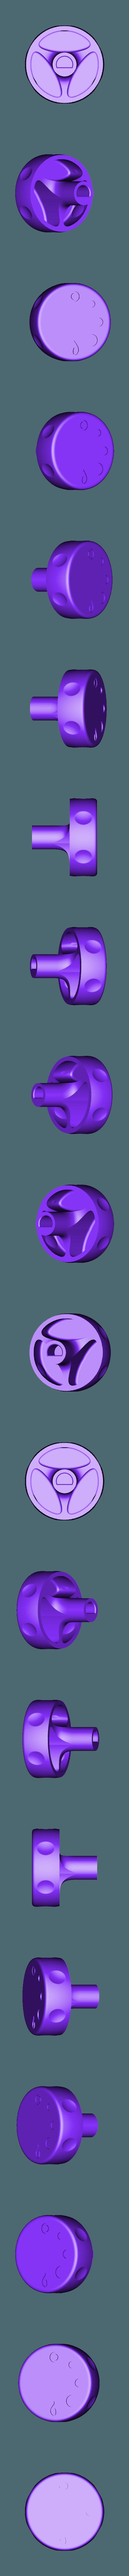 Stove_Knob_v1-3.STL Download free STL file Stove Knob • 3D print object, WalterHsiao